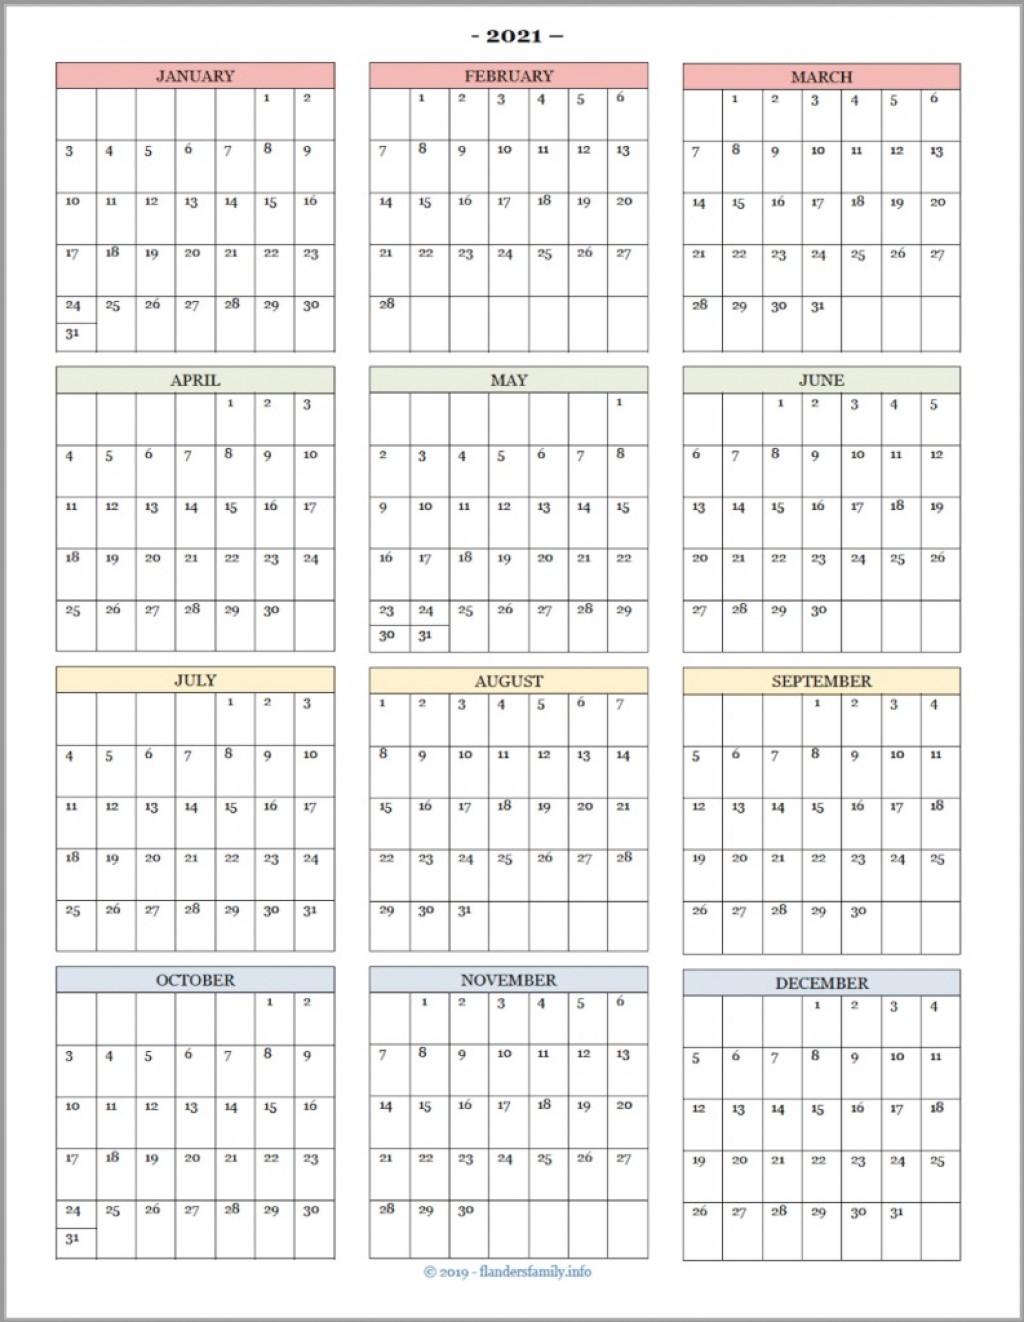 007 Singular School Year Calendar Template High Def  Excel 2019-20 WordLarge